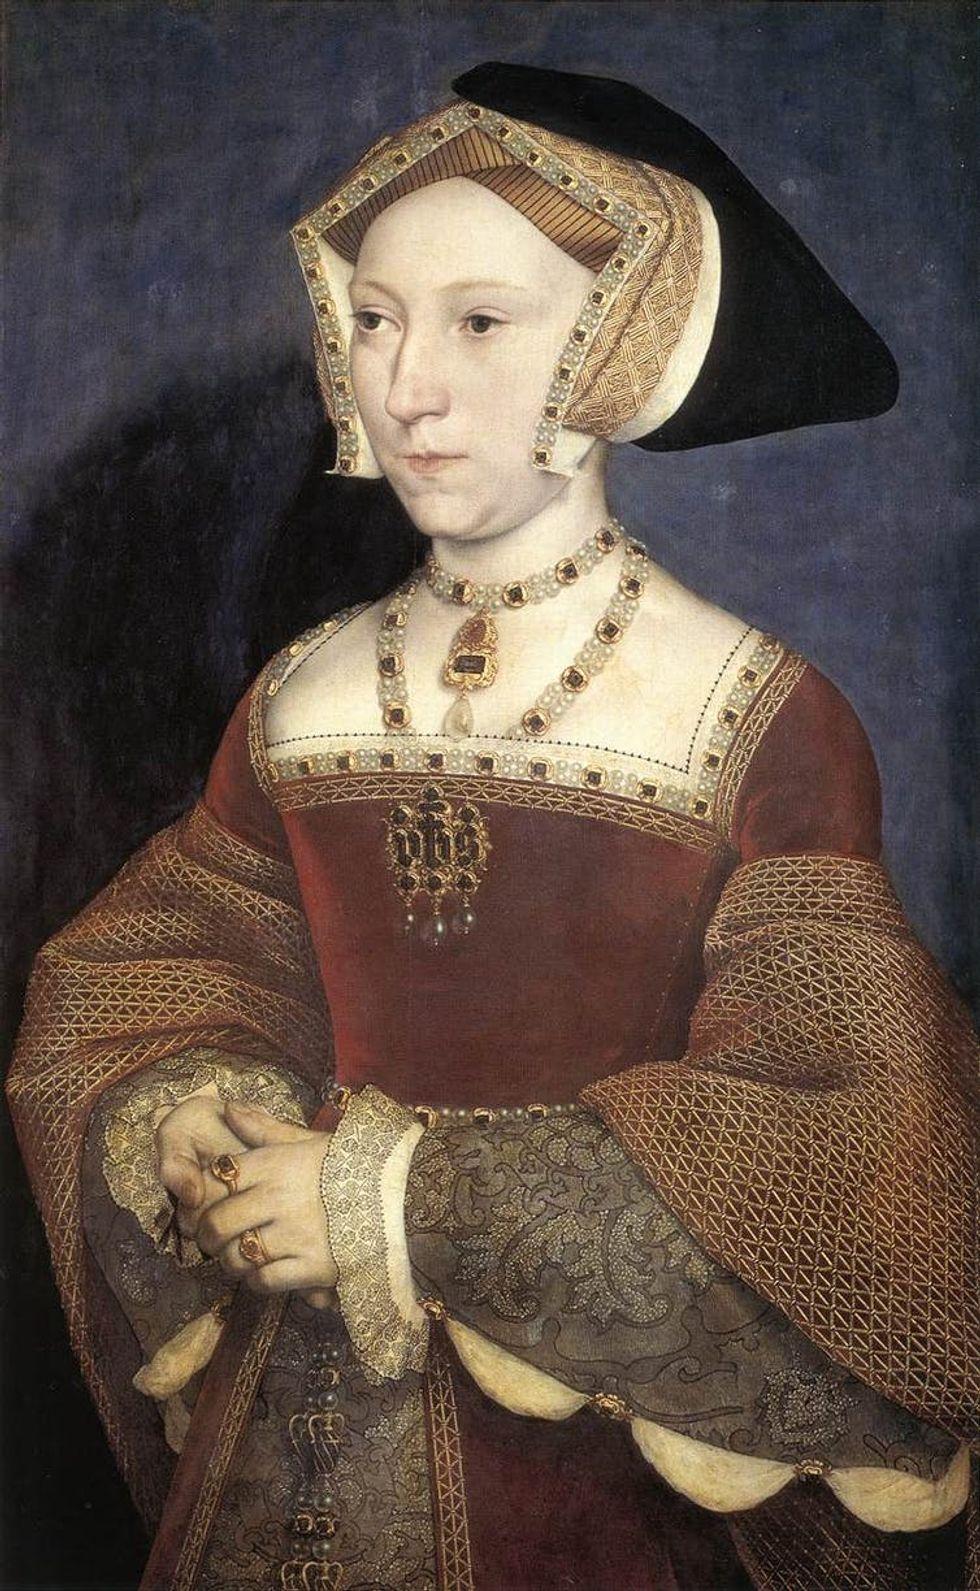 Portrait of Jane Seymour from 1536.